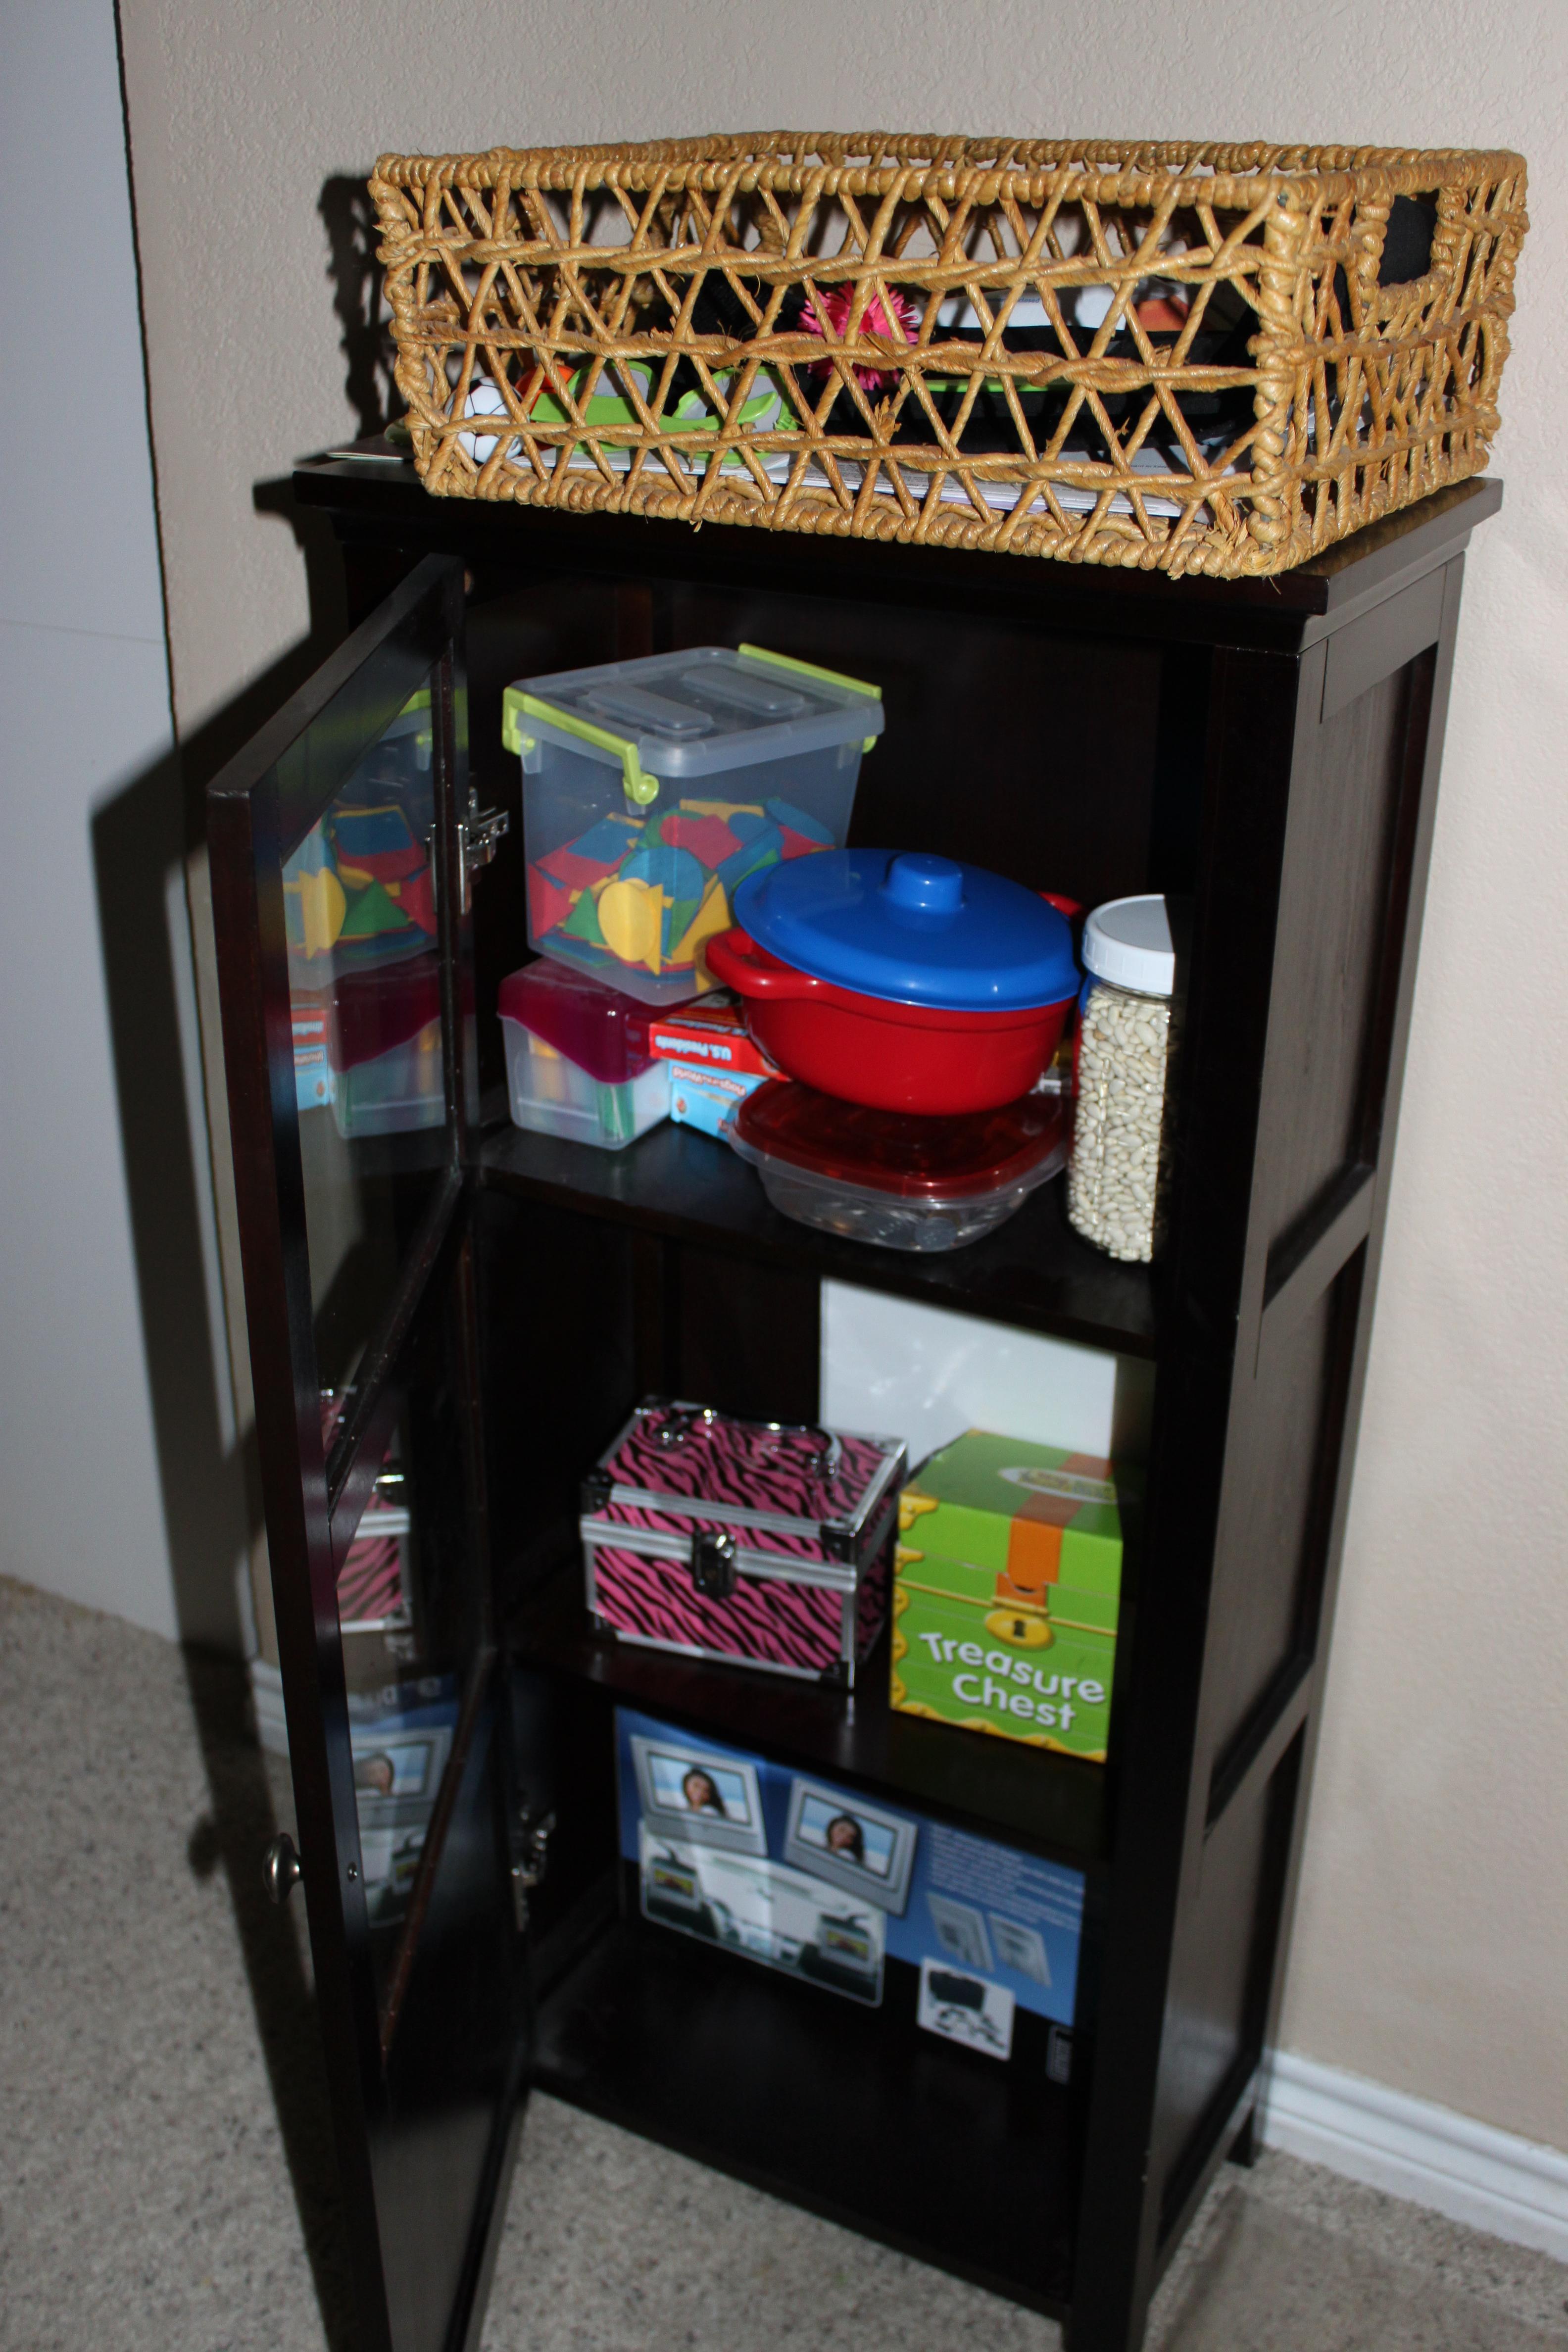 Random cabinet stuffed with school paraphernalia